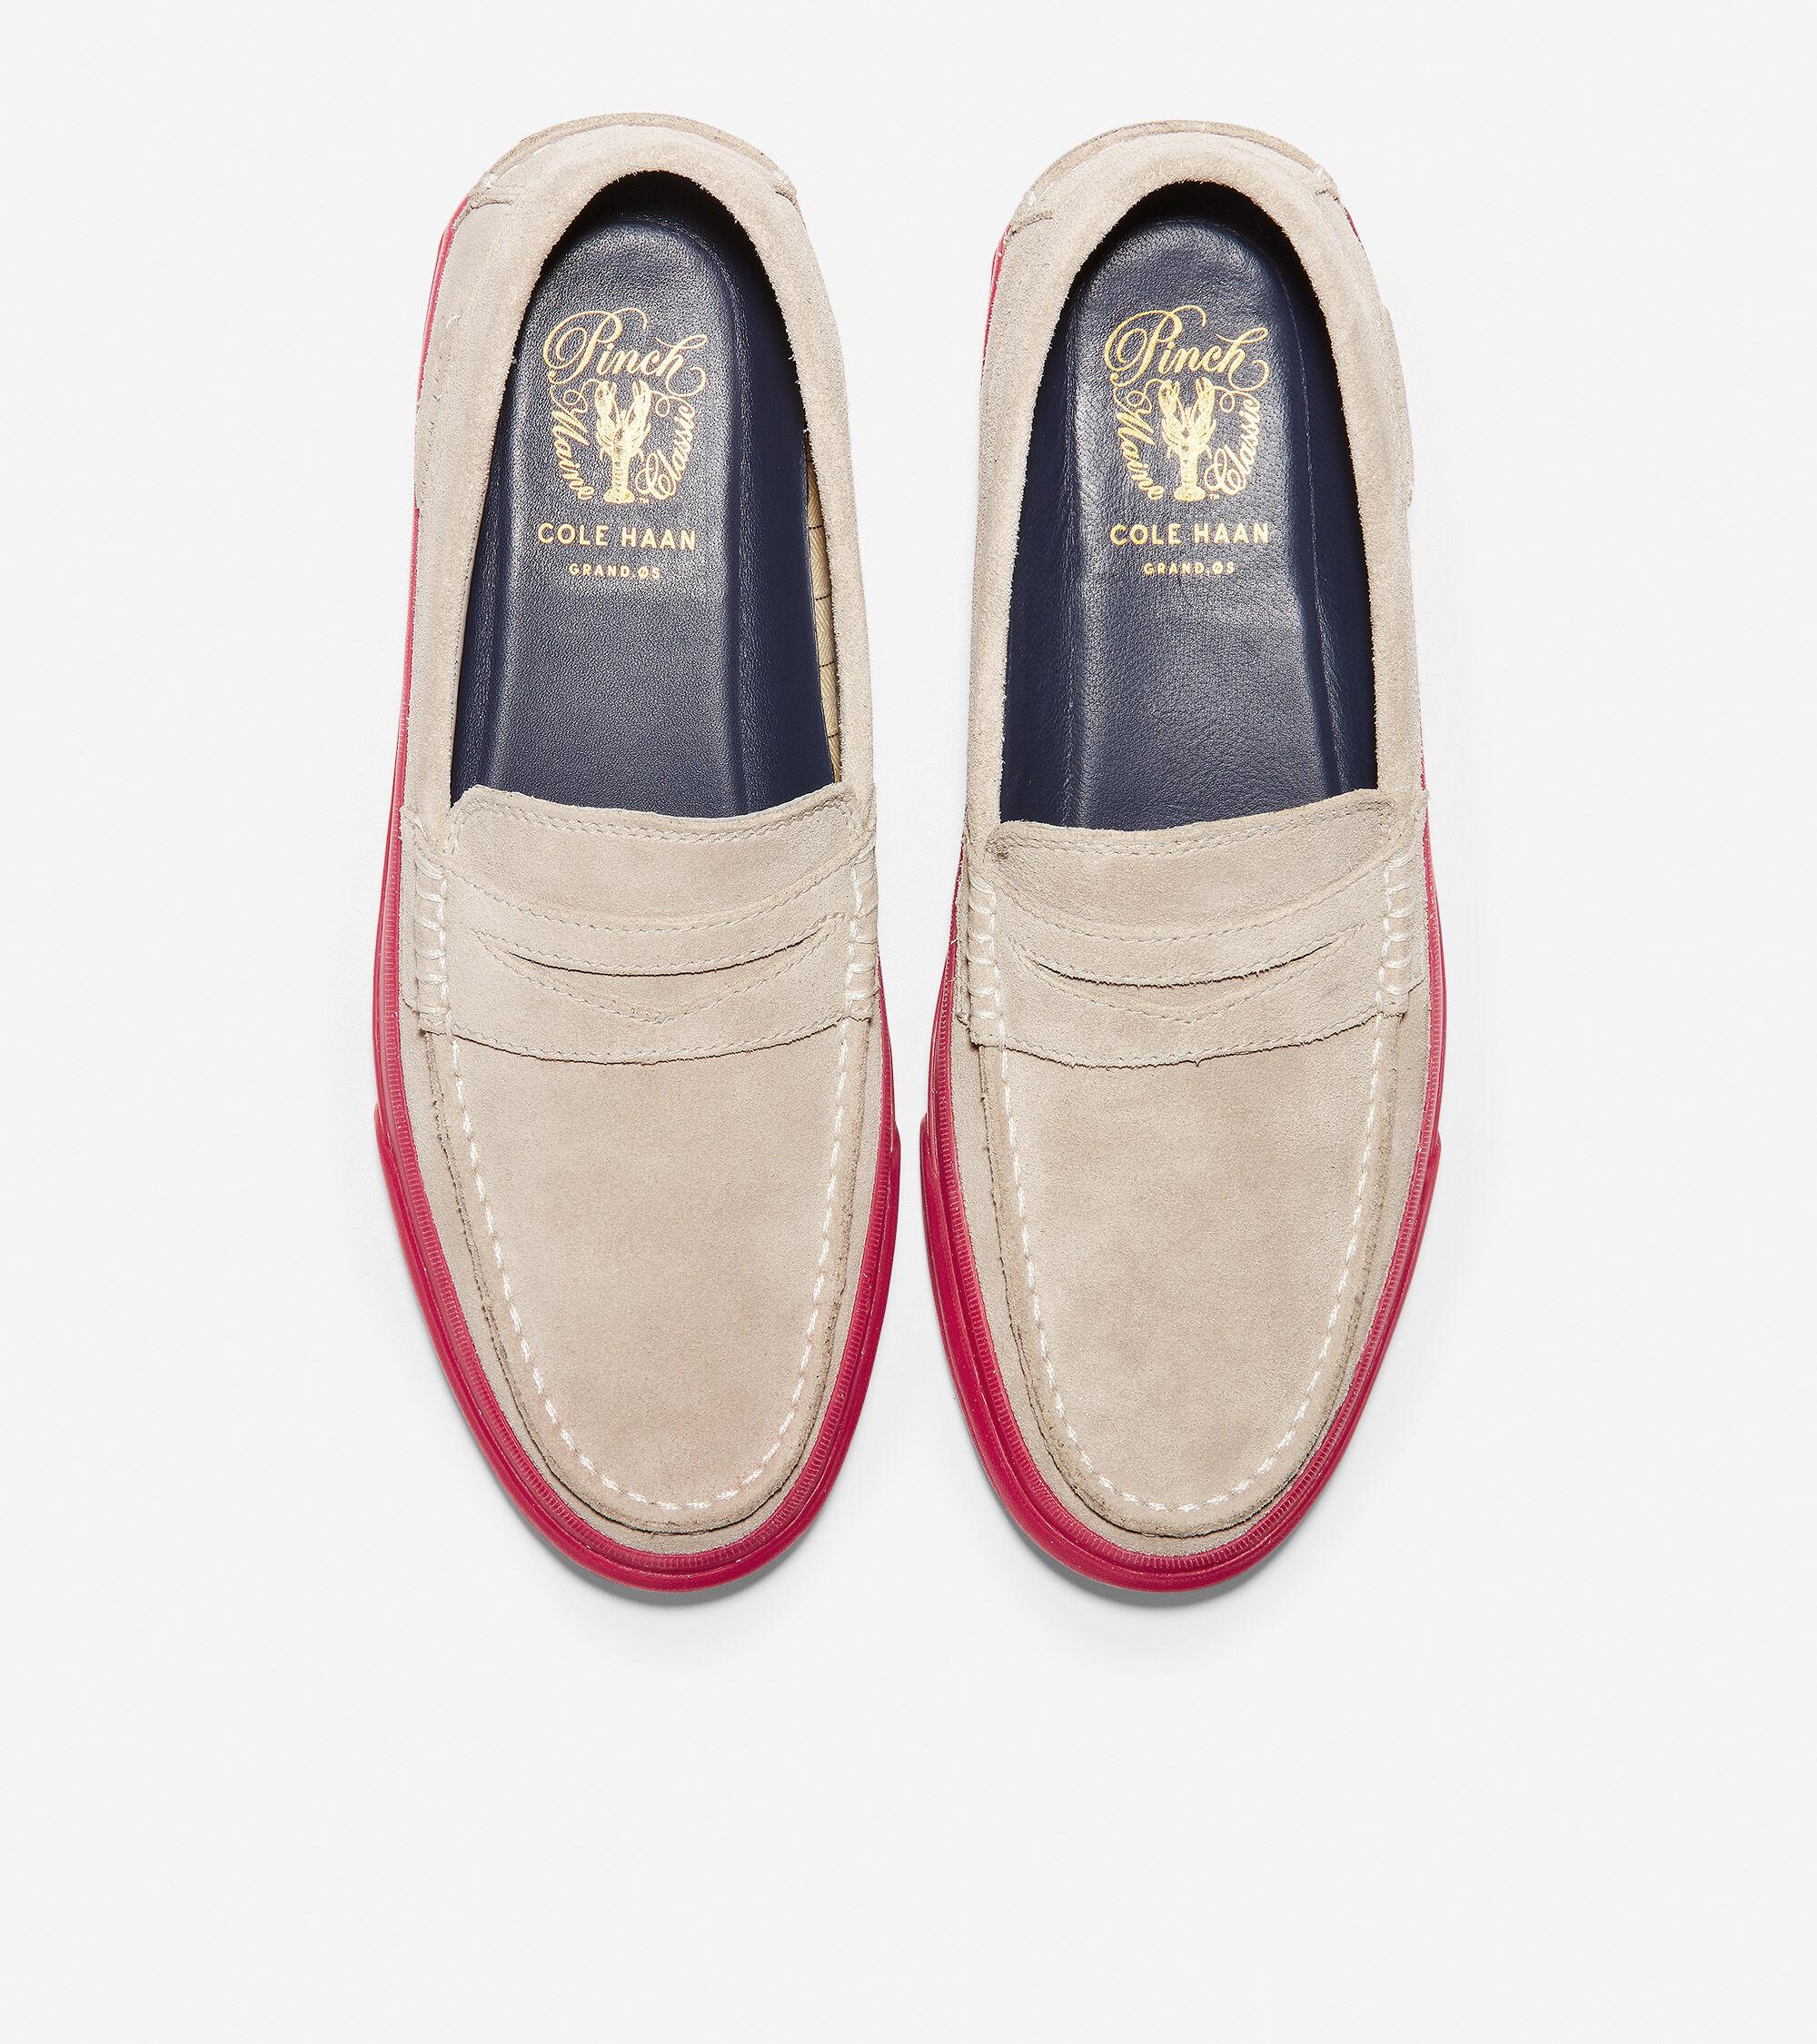 Men's Pinch Weekender LX Loafer in